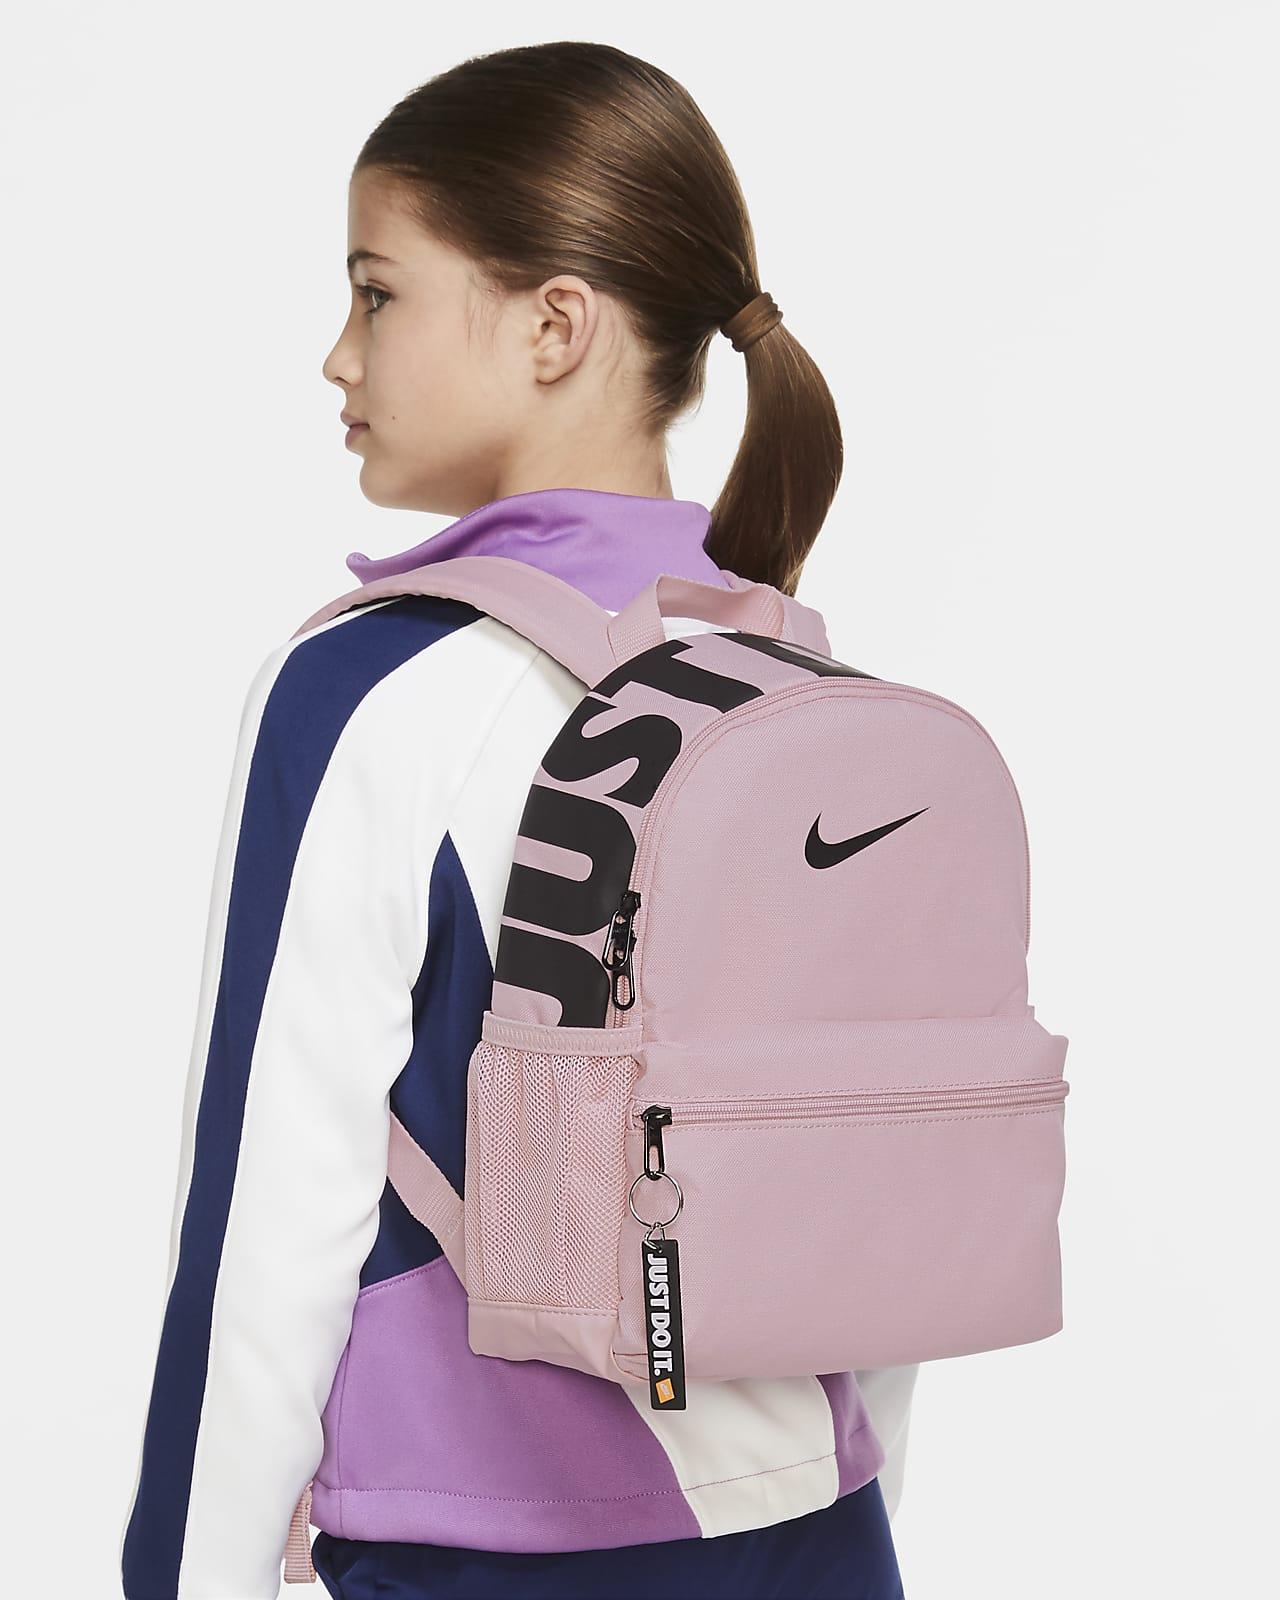 Nike Brasilia JDI Motxilla (petita) - Nen/a